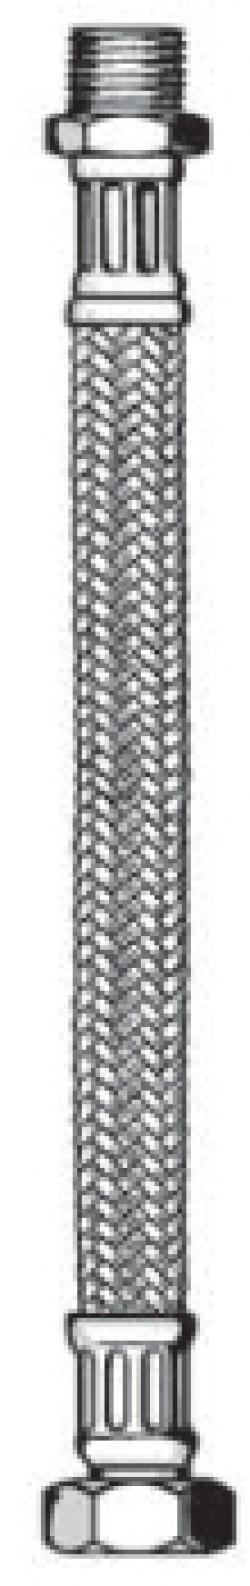 МЕ 5625.1227.80 Meiflex Dn18, 3/4 BPx3/4 BP, 800mm